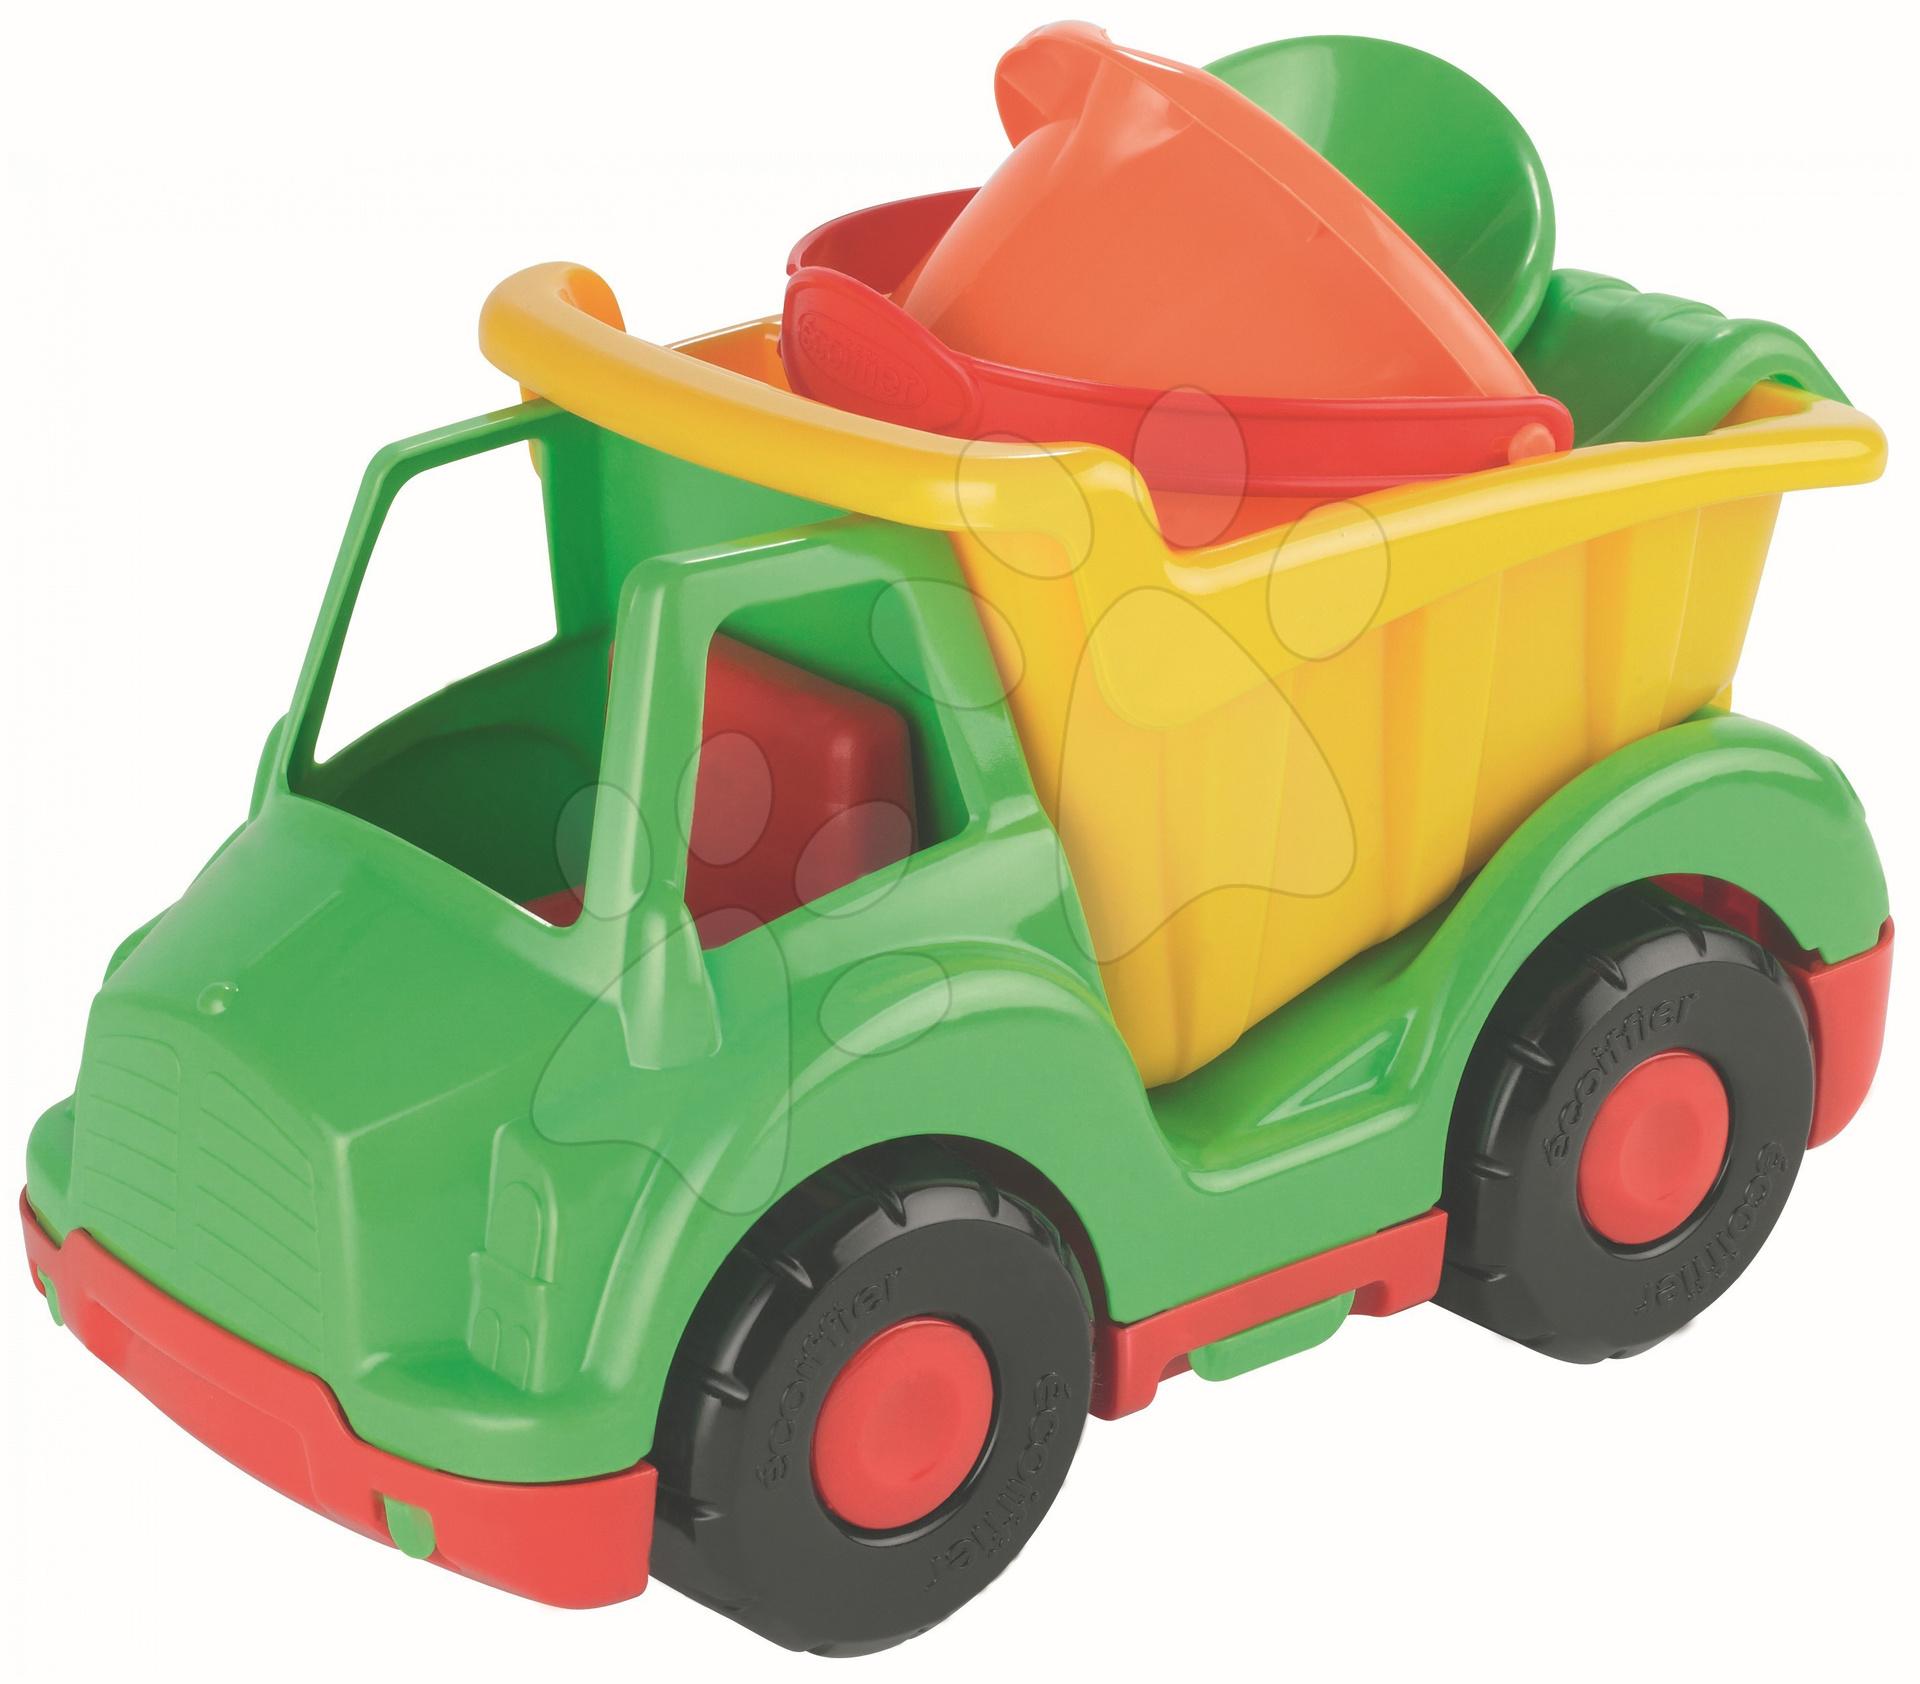 Nákladné auto Écoiffier zeleno žlté s vedro setom 3 kusy od 18 mes